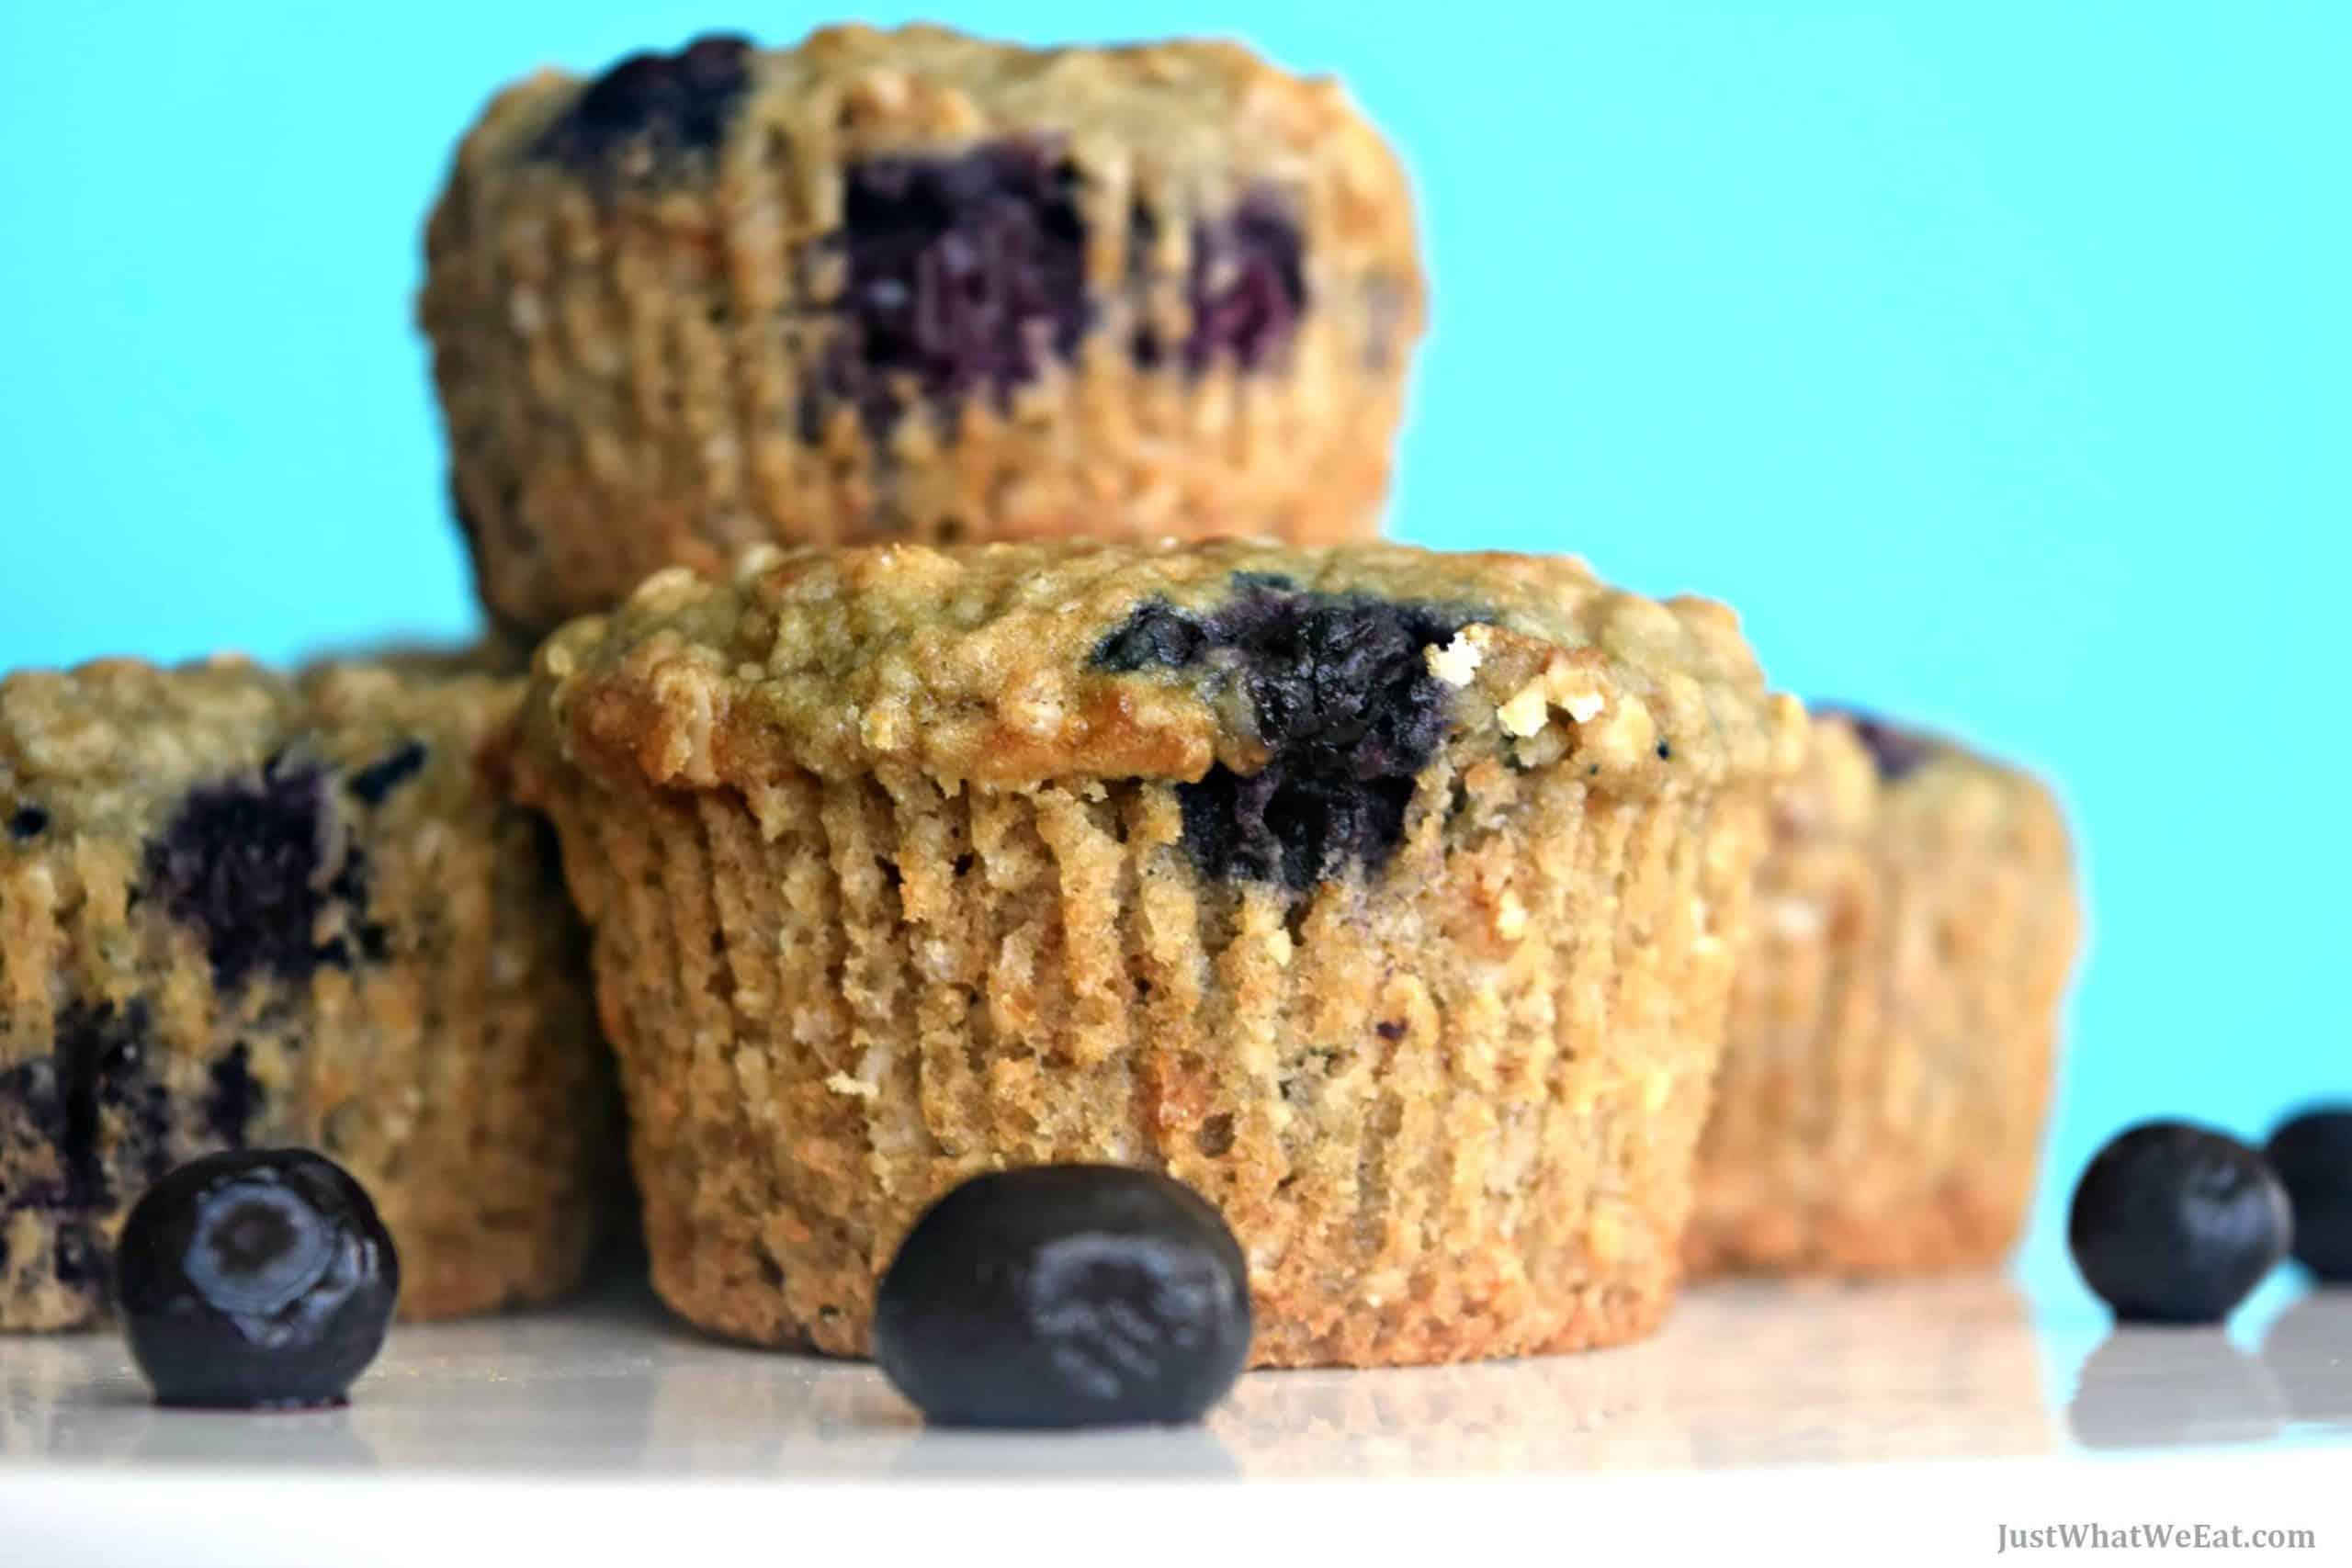 Blueberry Oat Muffins - Gluten Free, Vegan, & Refined Sugar Free